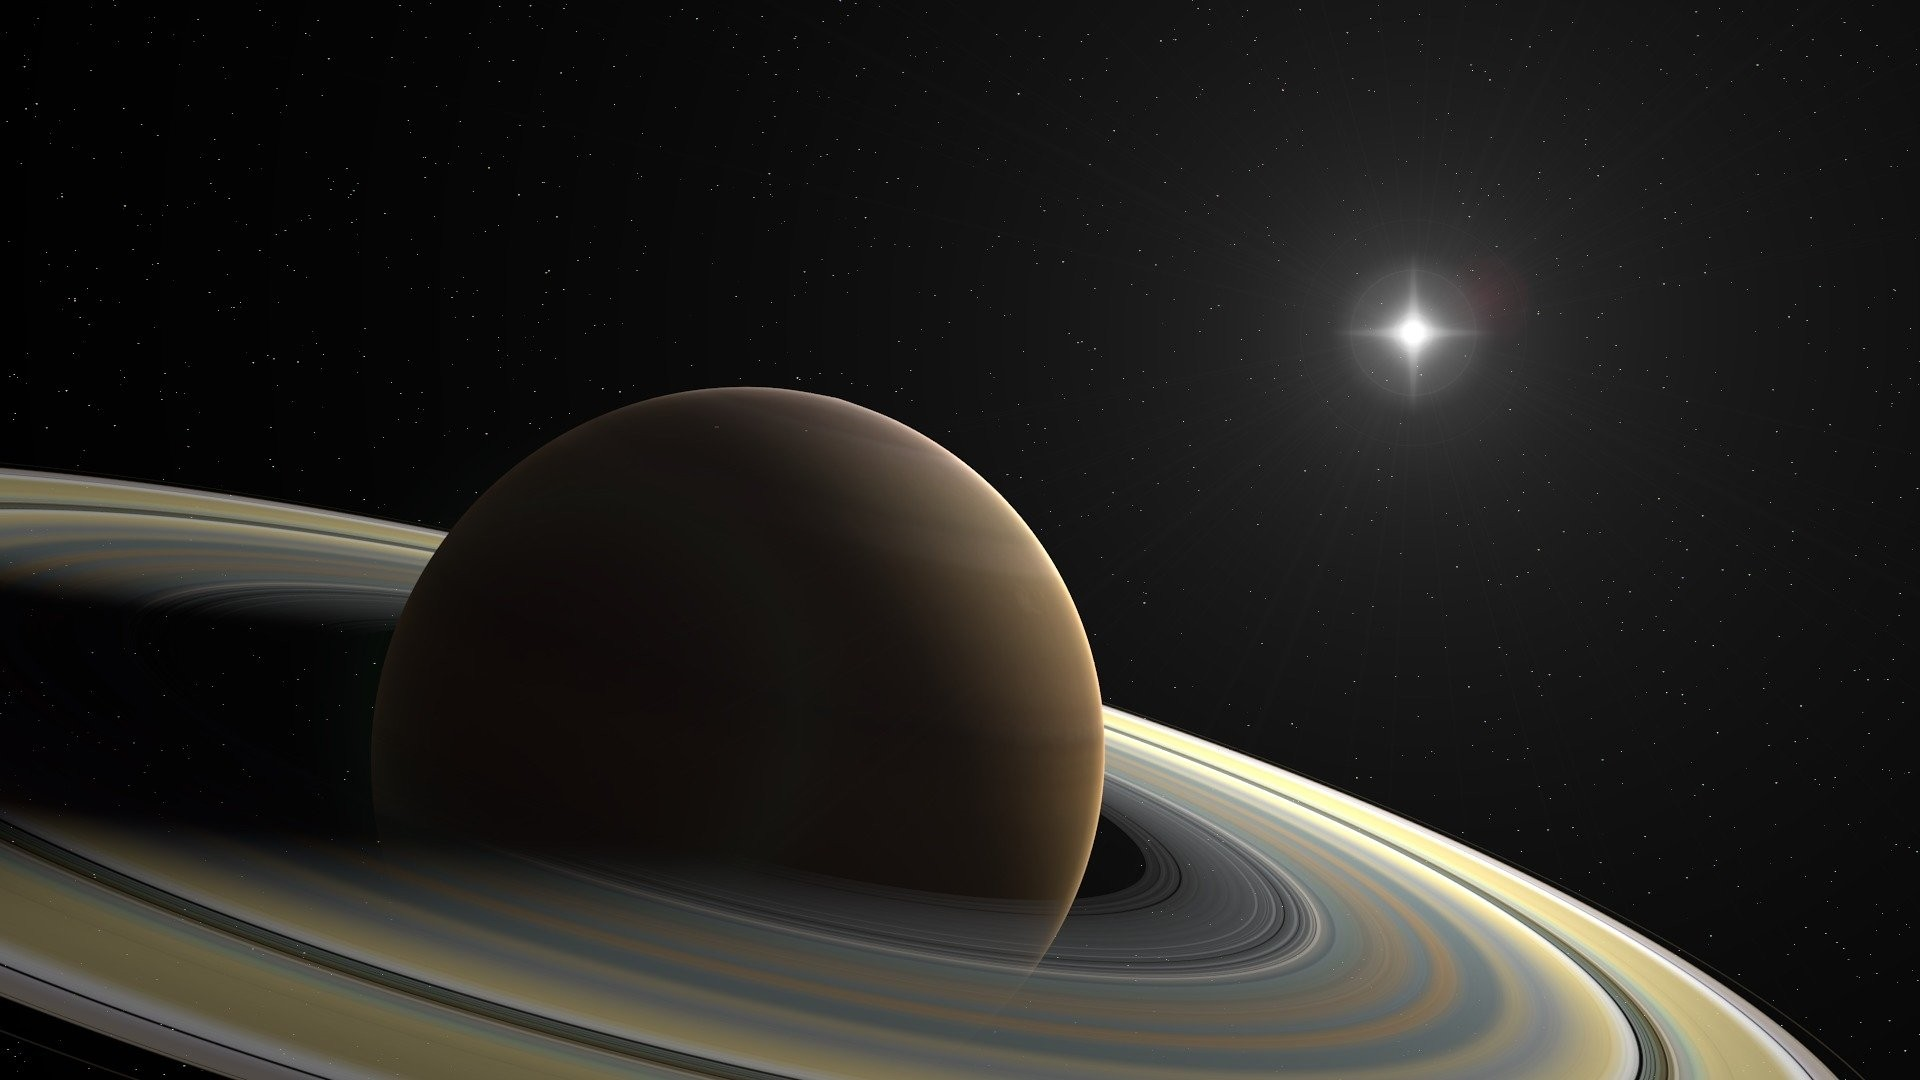 Saturn a Wallpaper